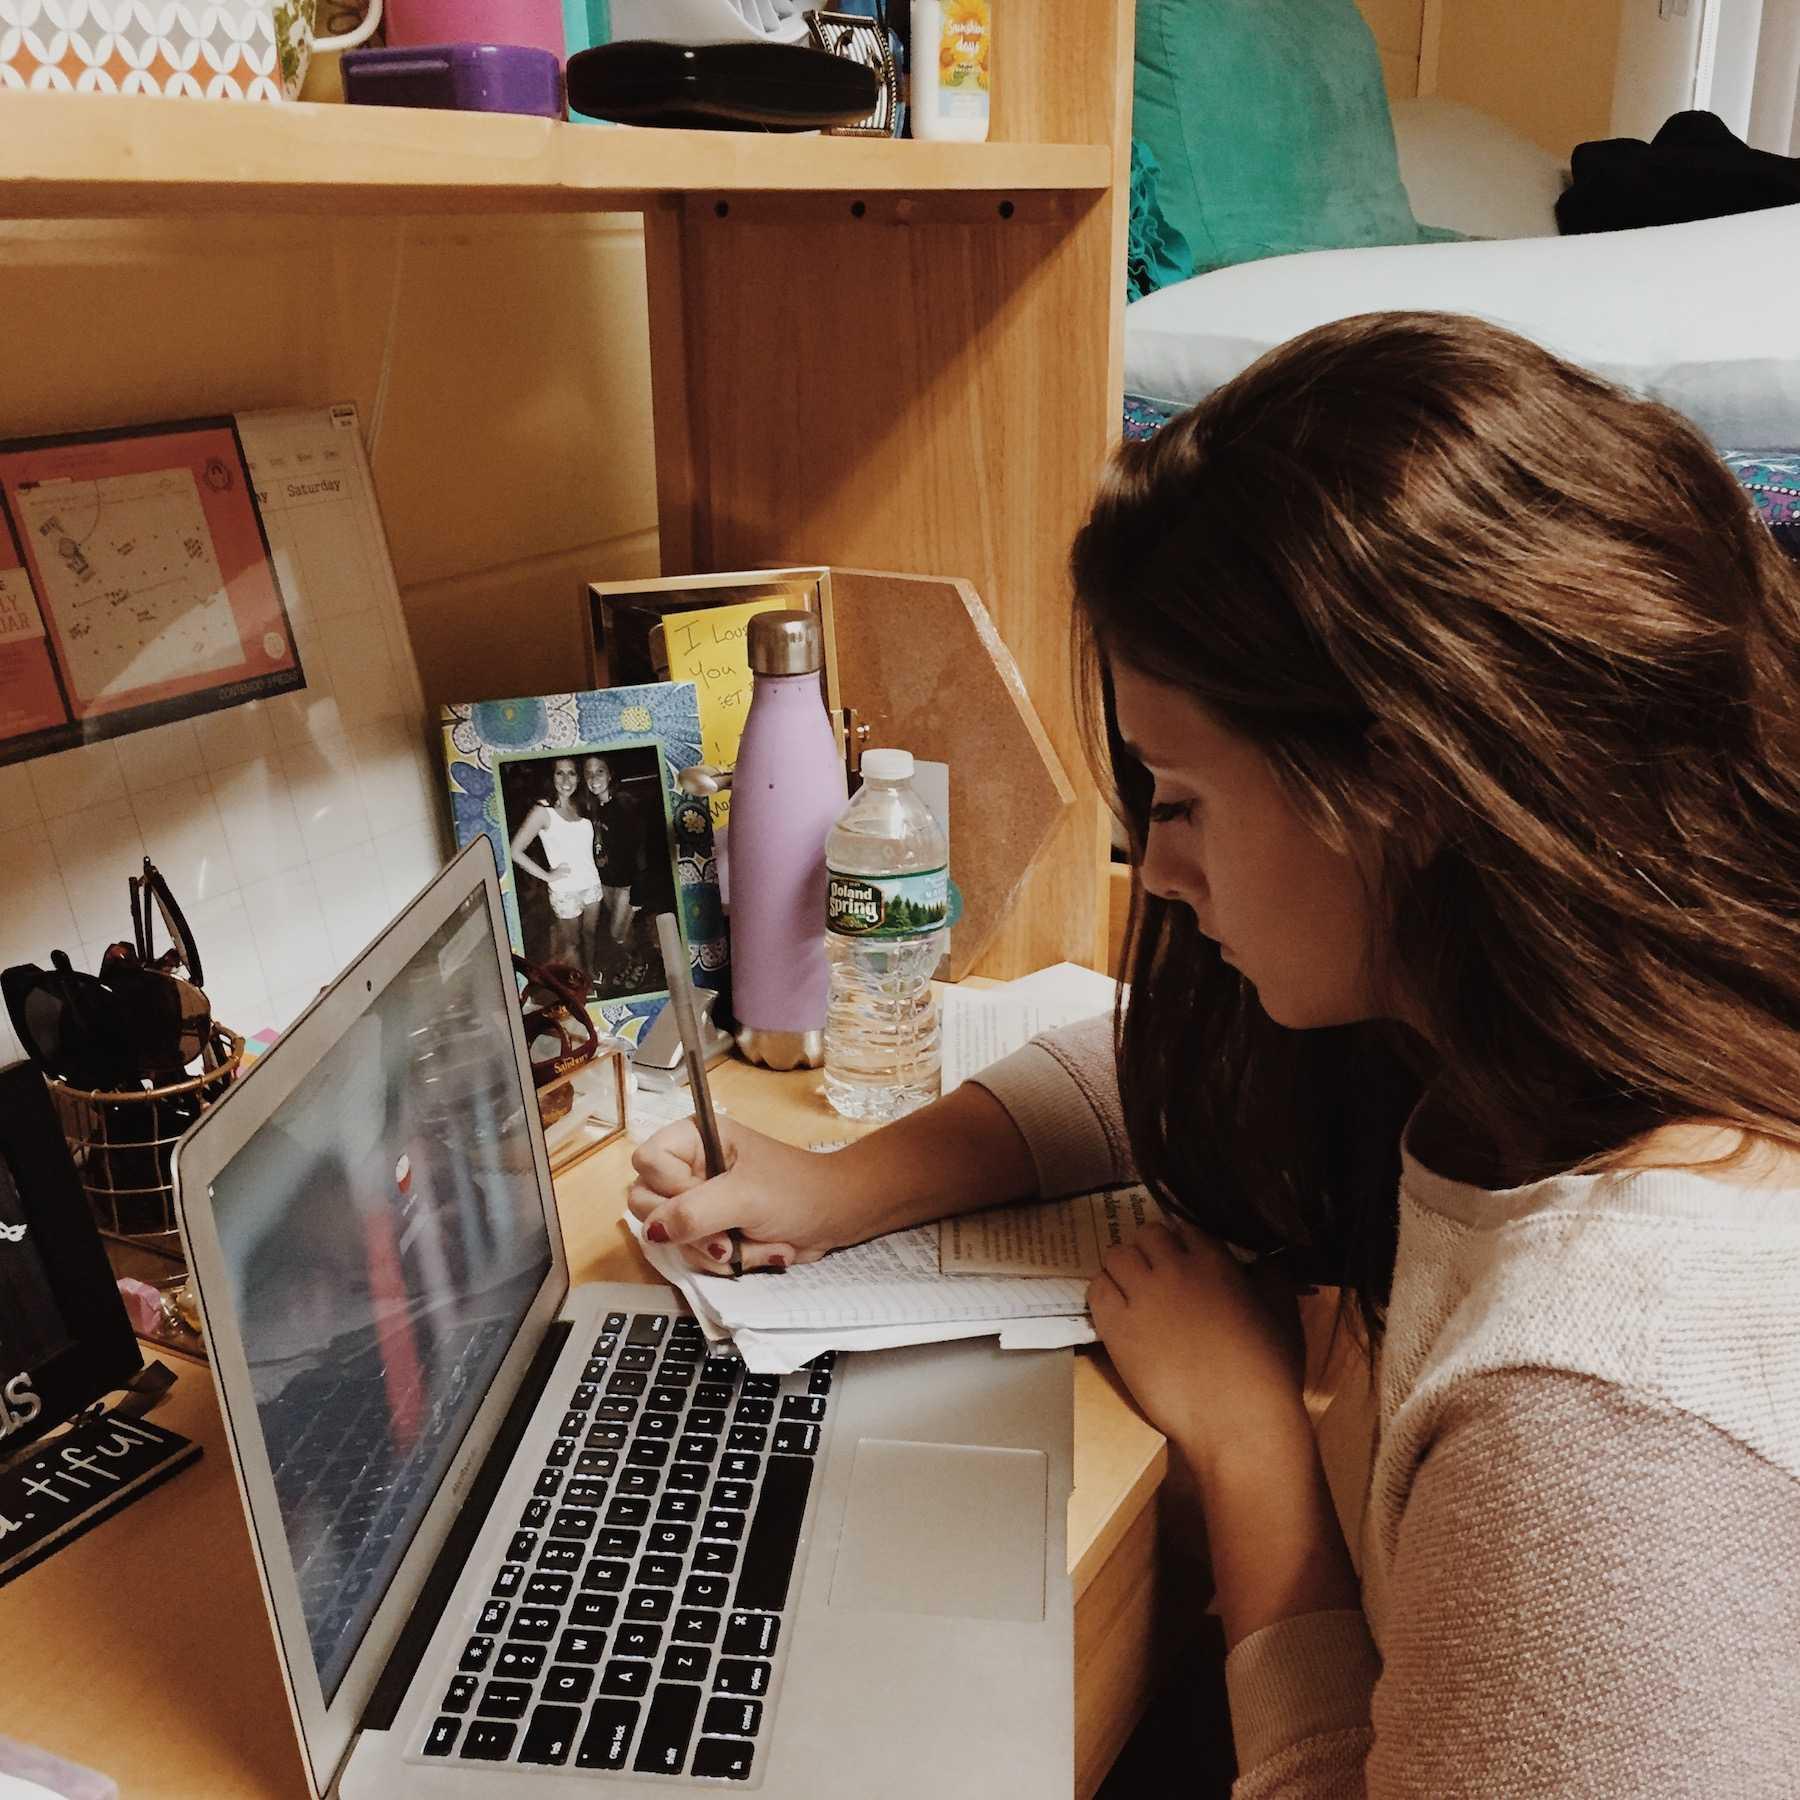 Caitlin Burke, class of 2016, works at her desk inside her dorm room at Salisbury University in Maryland.